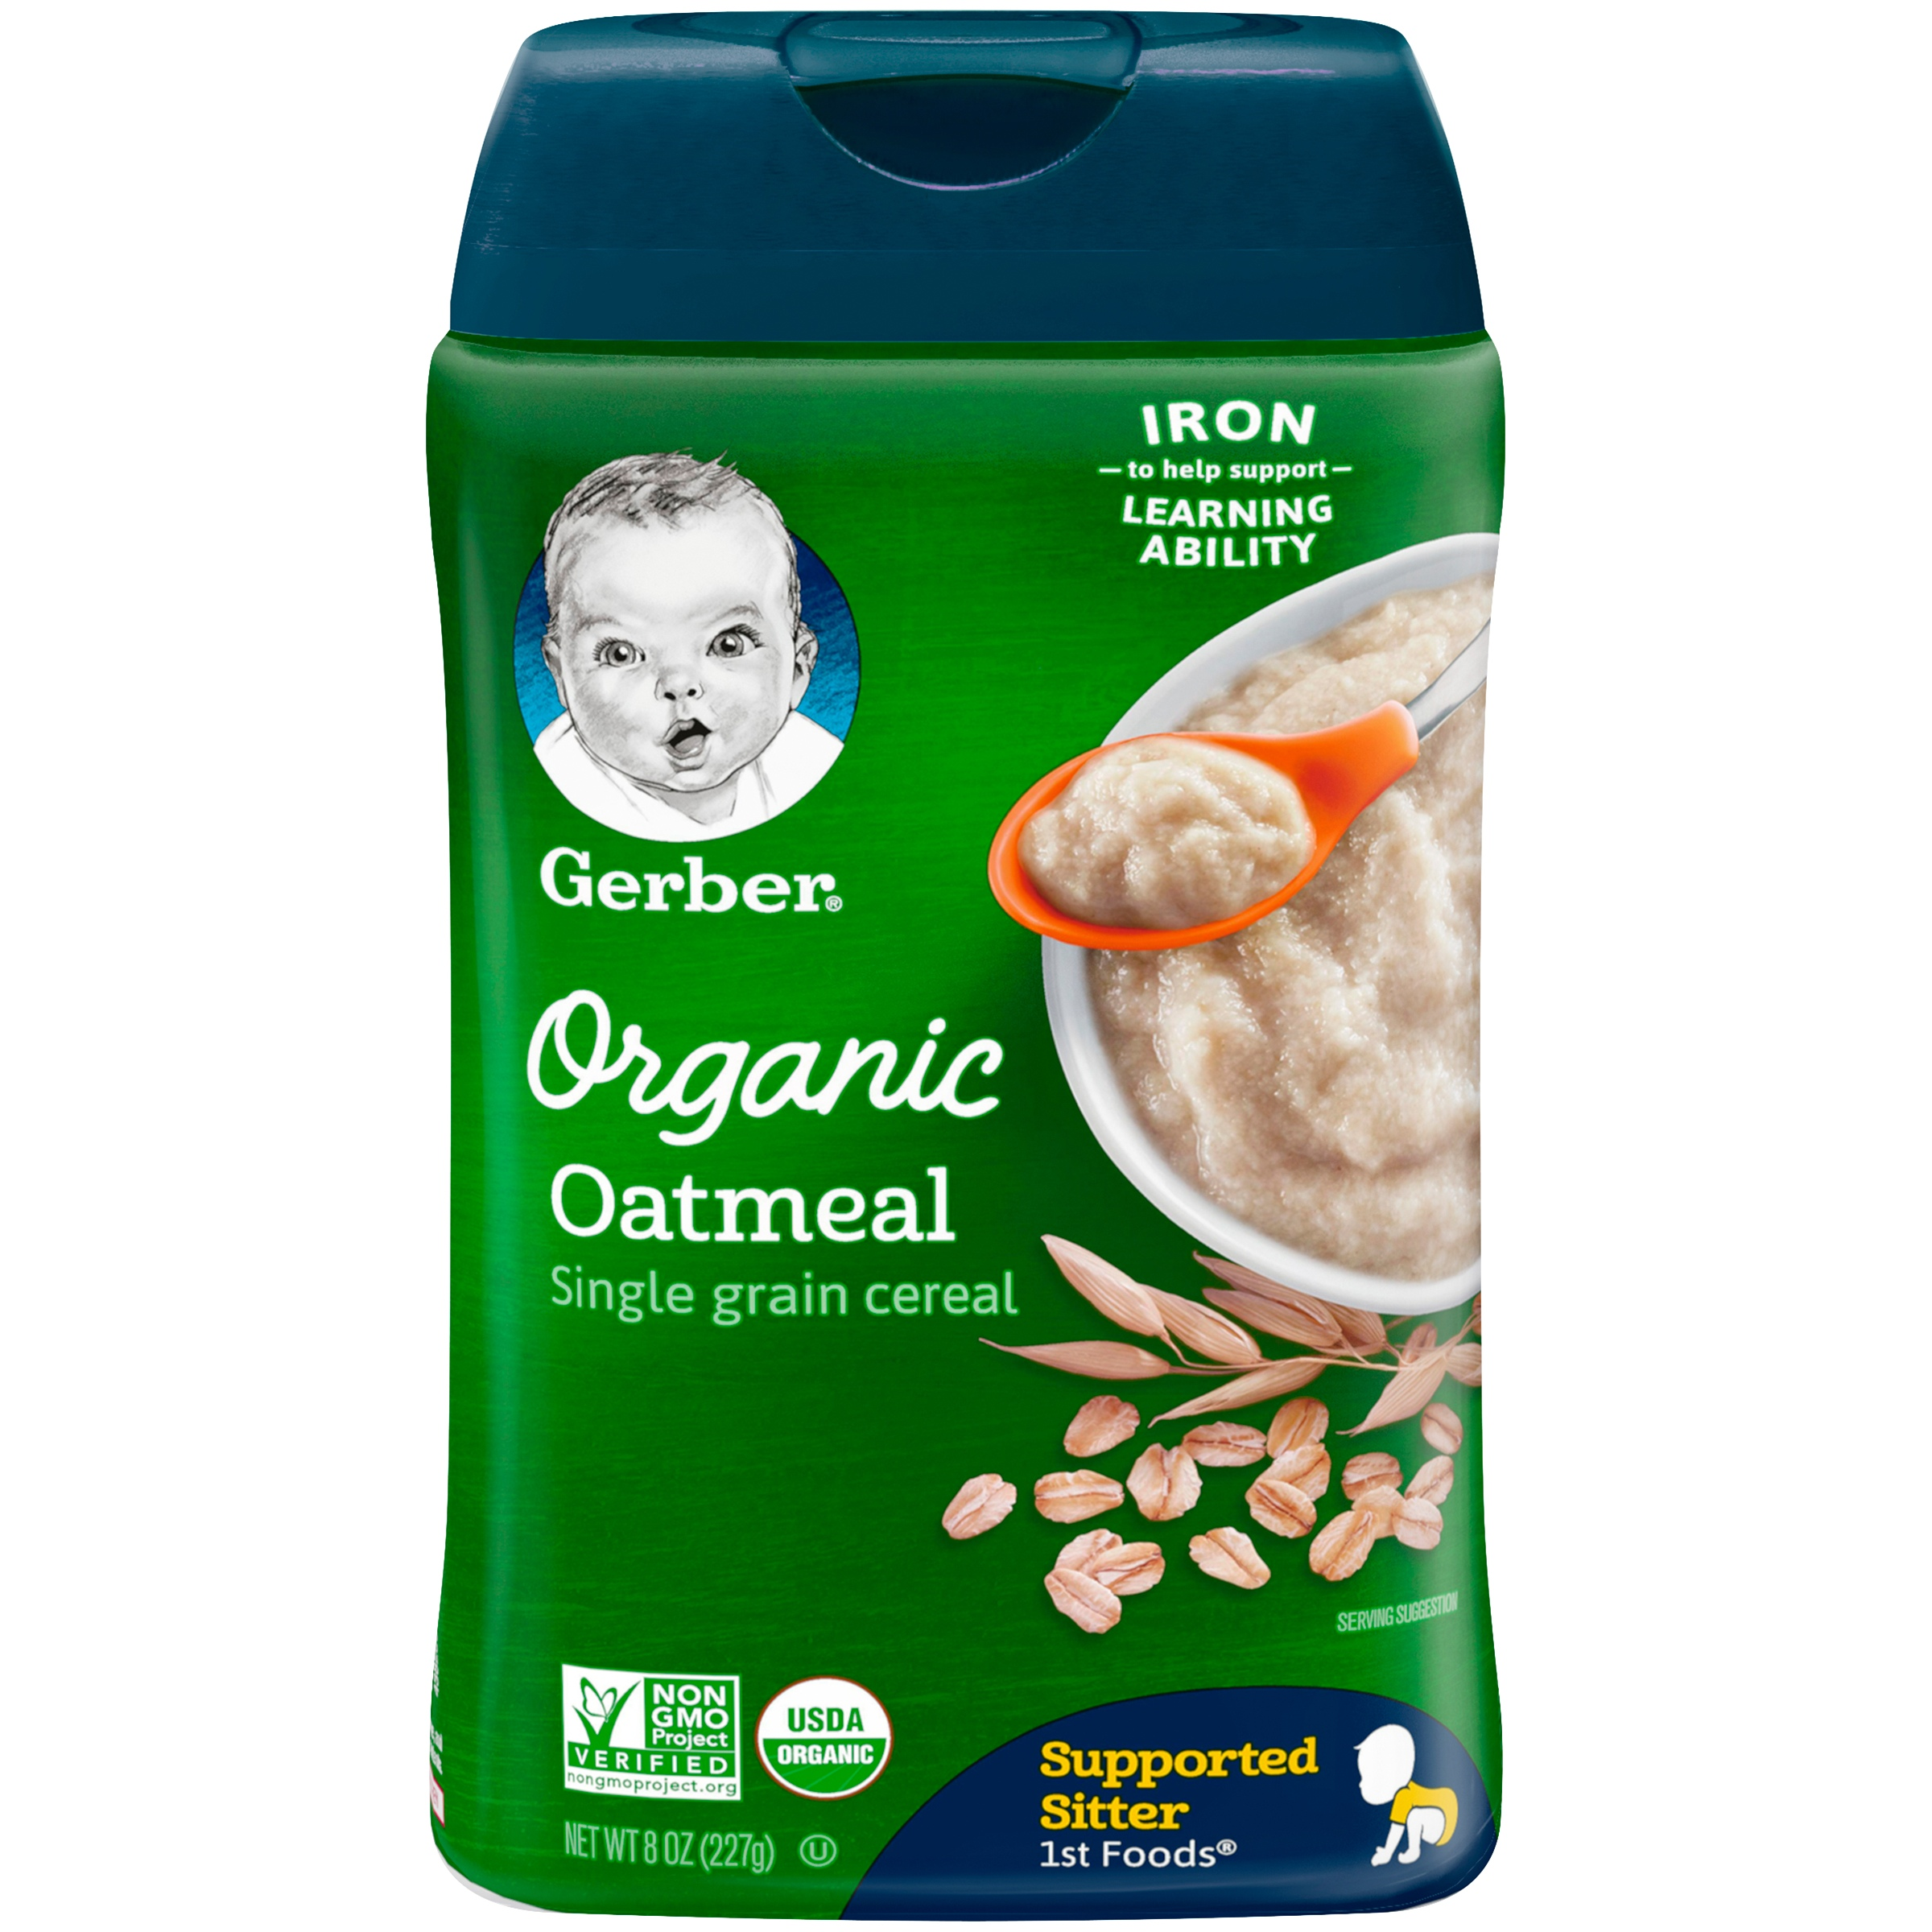 Gerber Organic Single-Grain Oatmeal Baby Cereal, 8 oz.